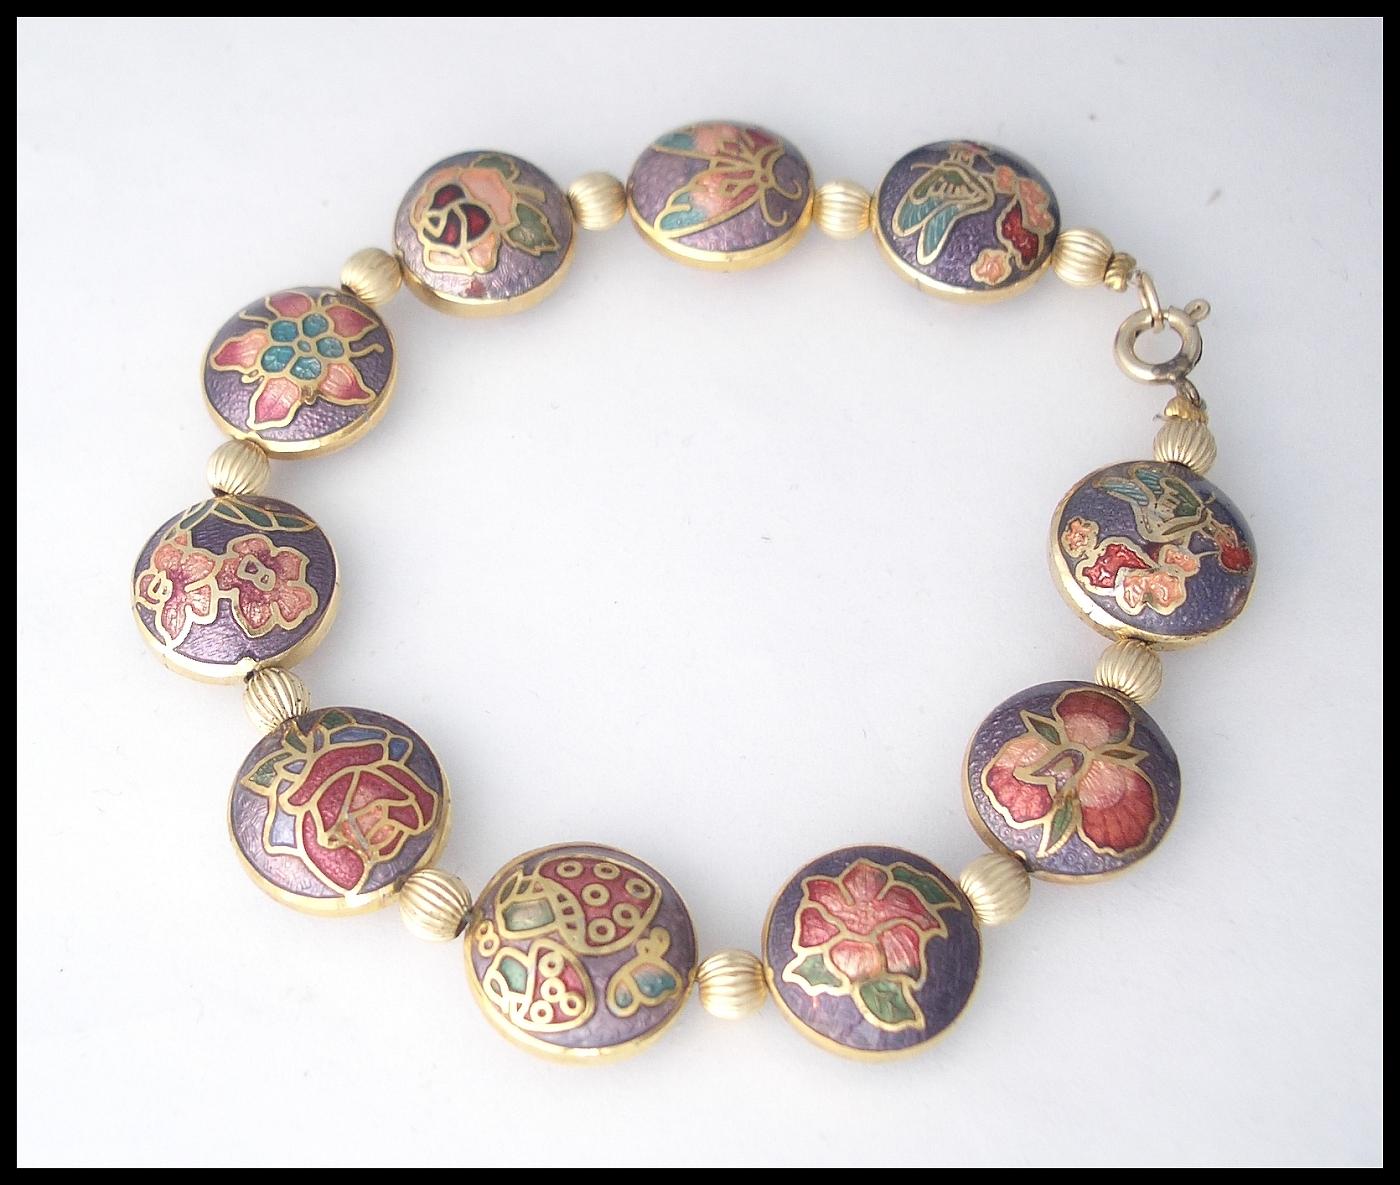 1 Watch 1 Bracelet 1 Necklace and 2 Earrings Strass Rhinestones Shamballa Pink -Set of 4 Jewellerys GOCaOIHT